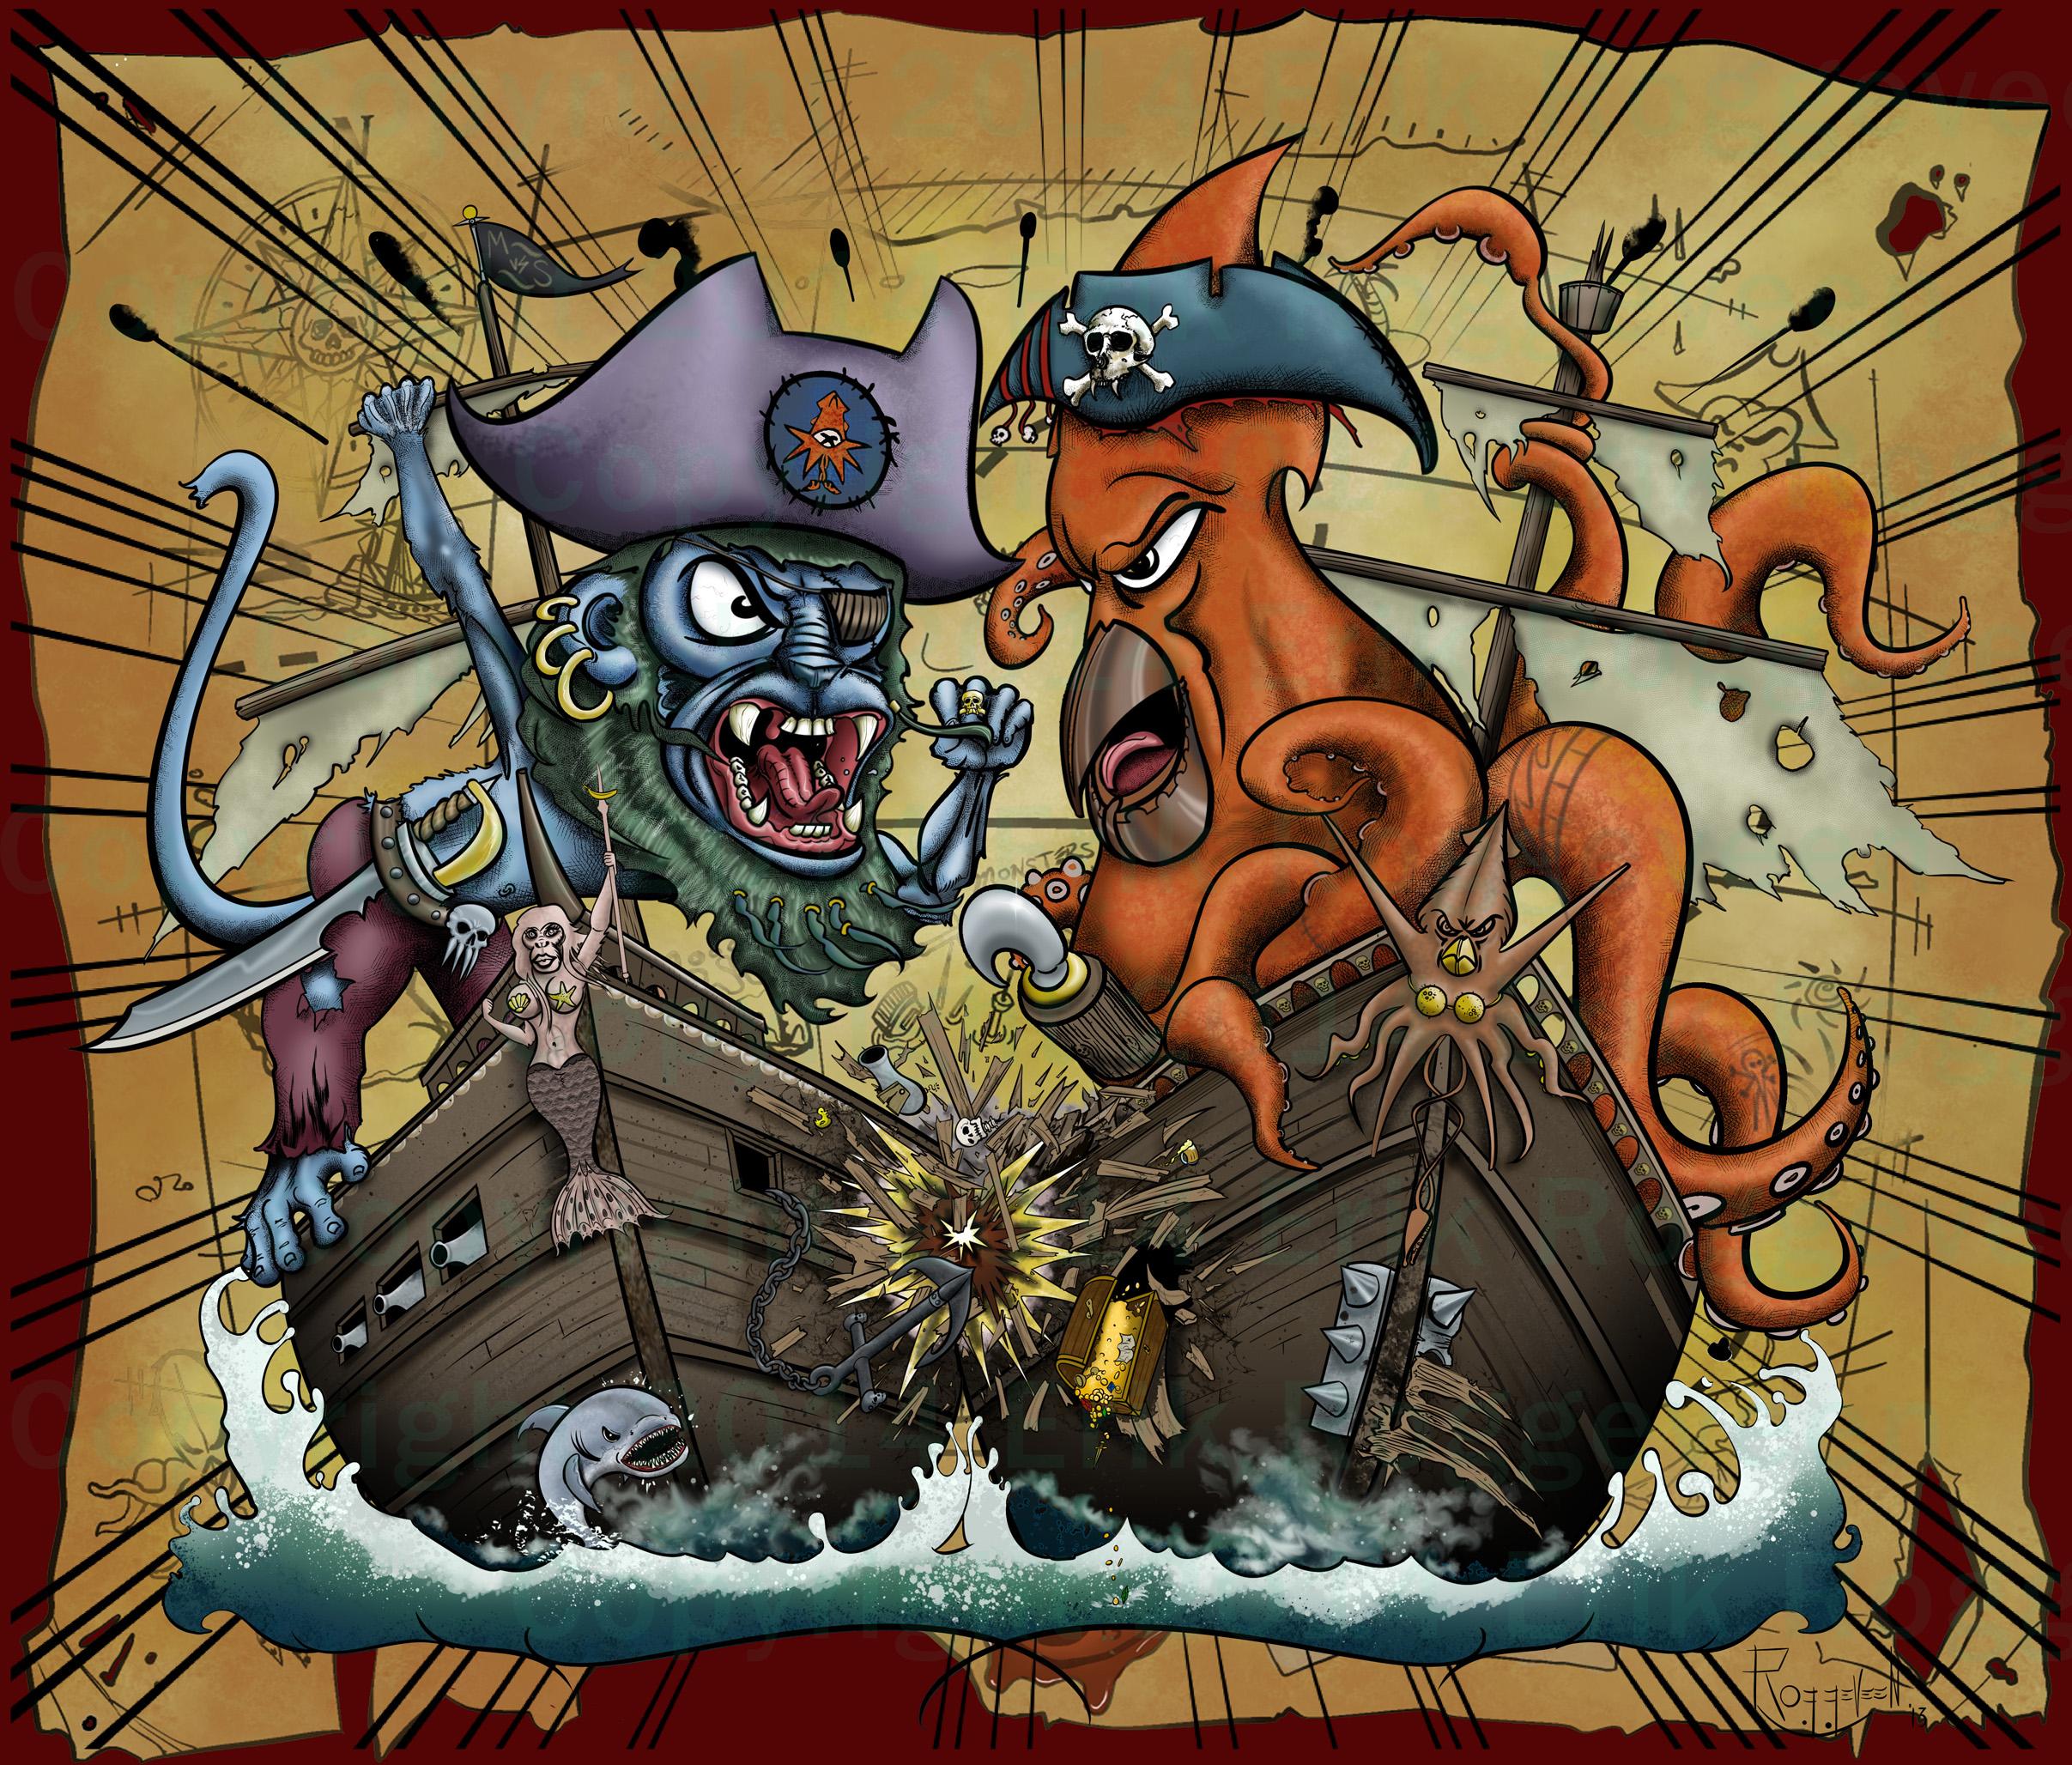 Monkey Vs Squid ships crashing by Erik Roggeveen